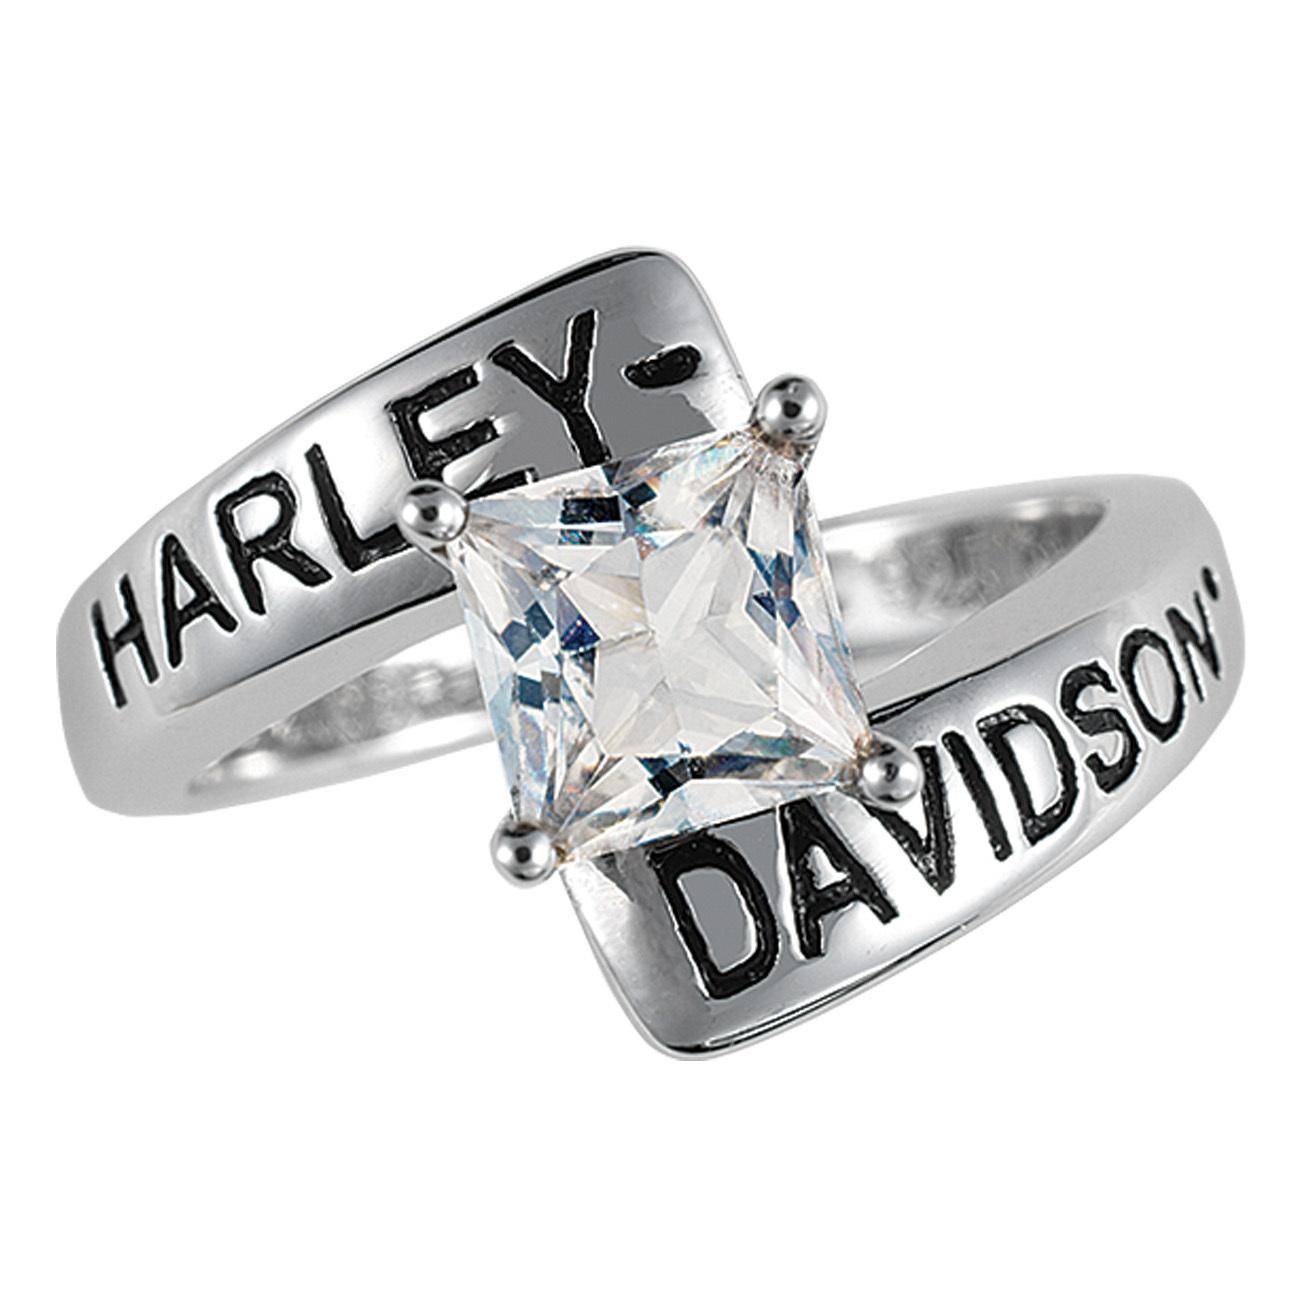 harley davidson ladies crossroads birthstone ring woman. Black Bedroom Furniture Sets. Home Design Ideas